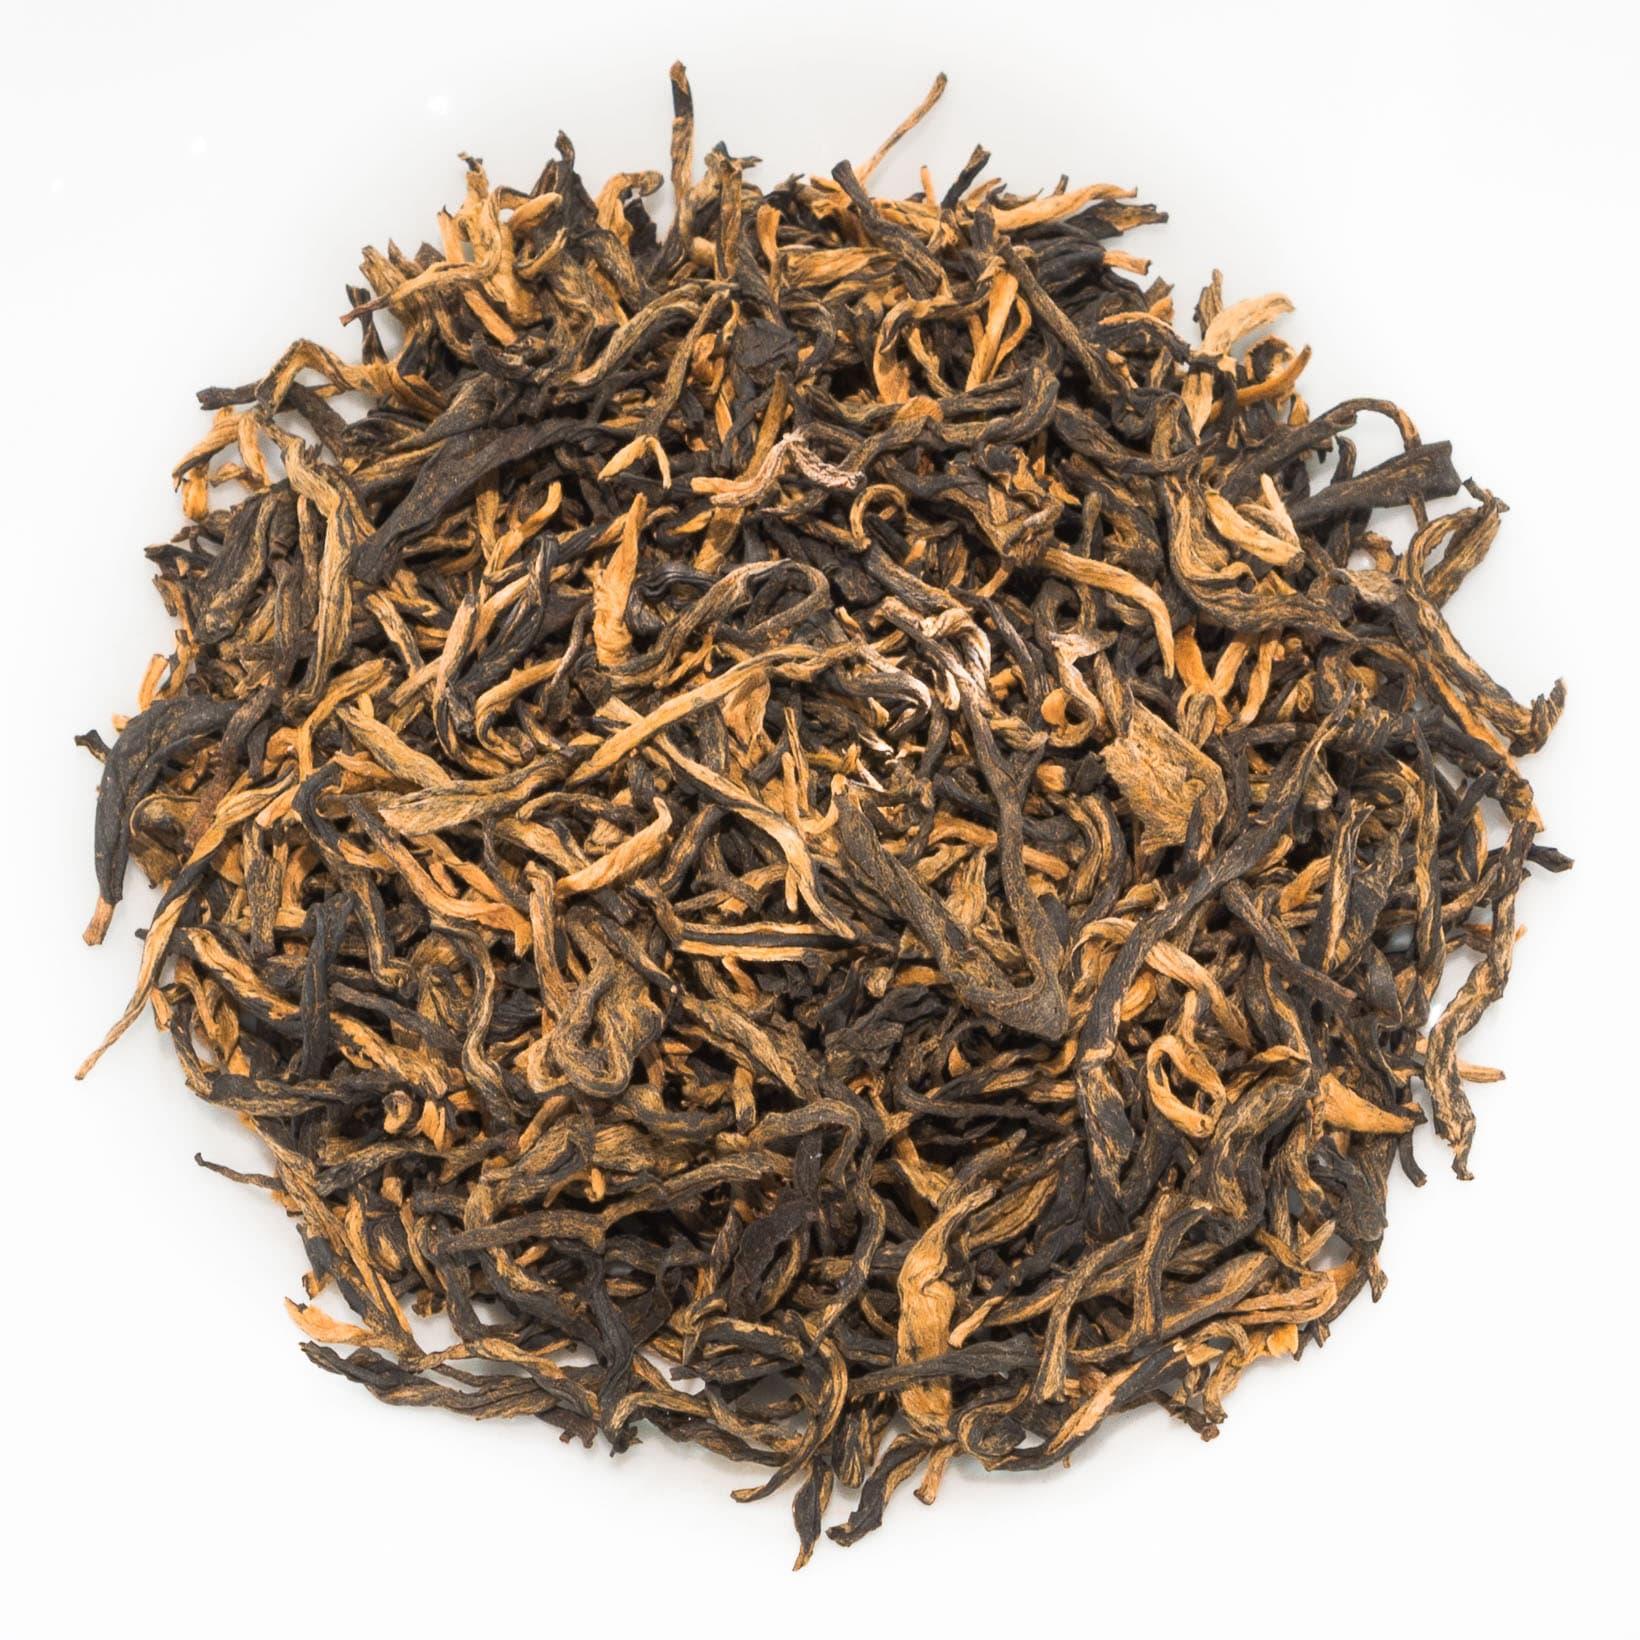 Chinese Golden Monkey King Black Tea Curious Tea